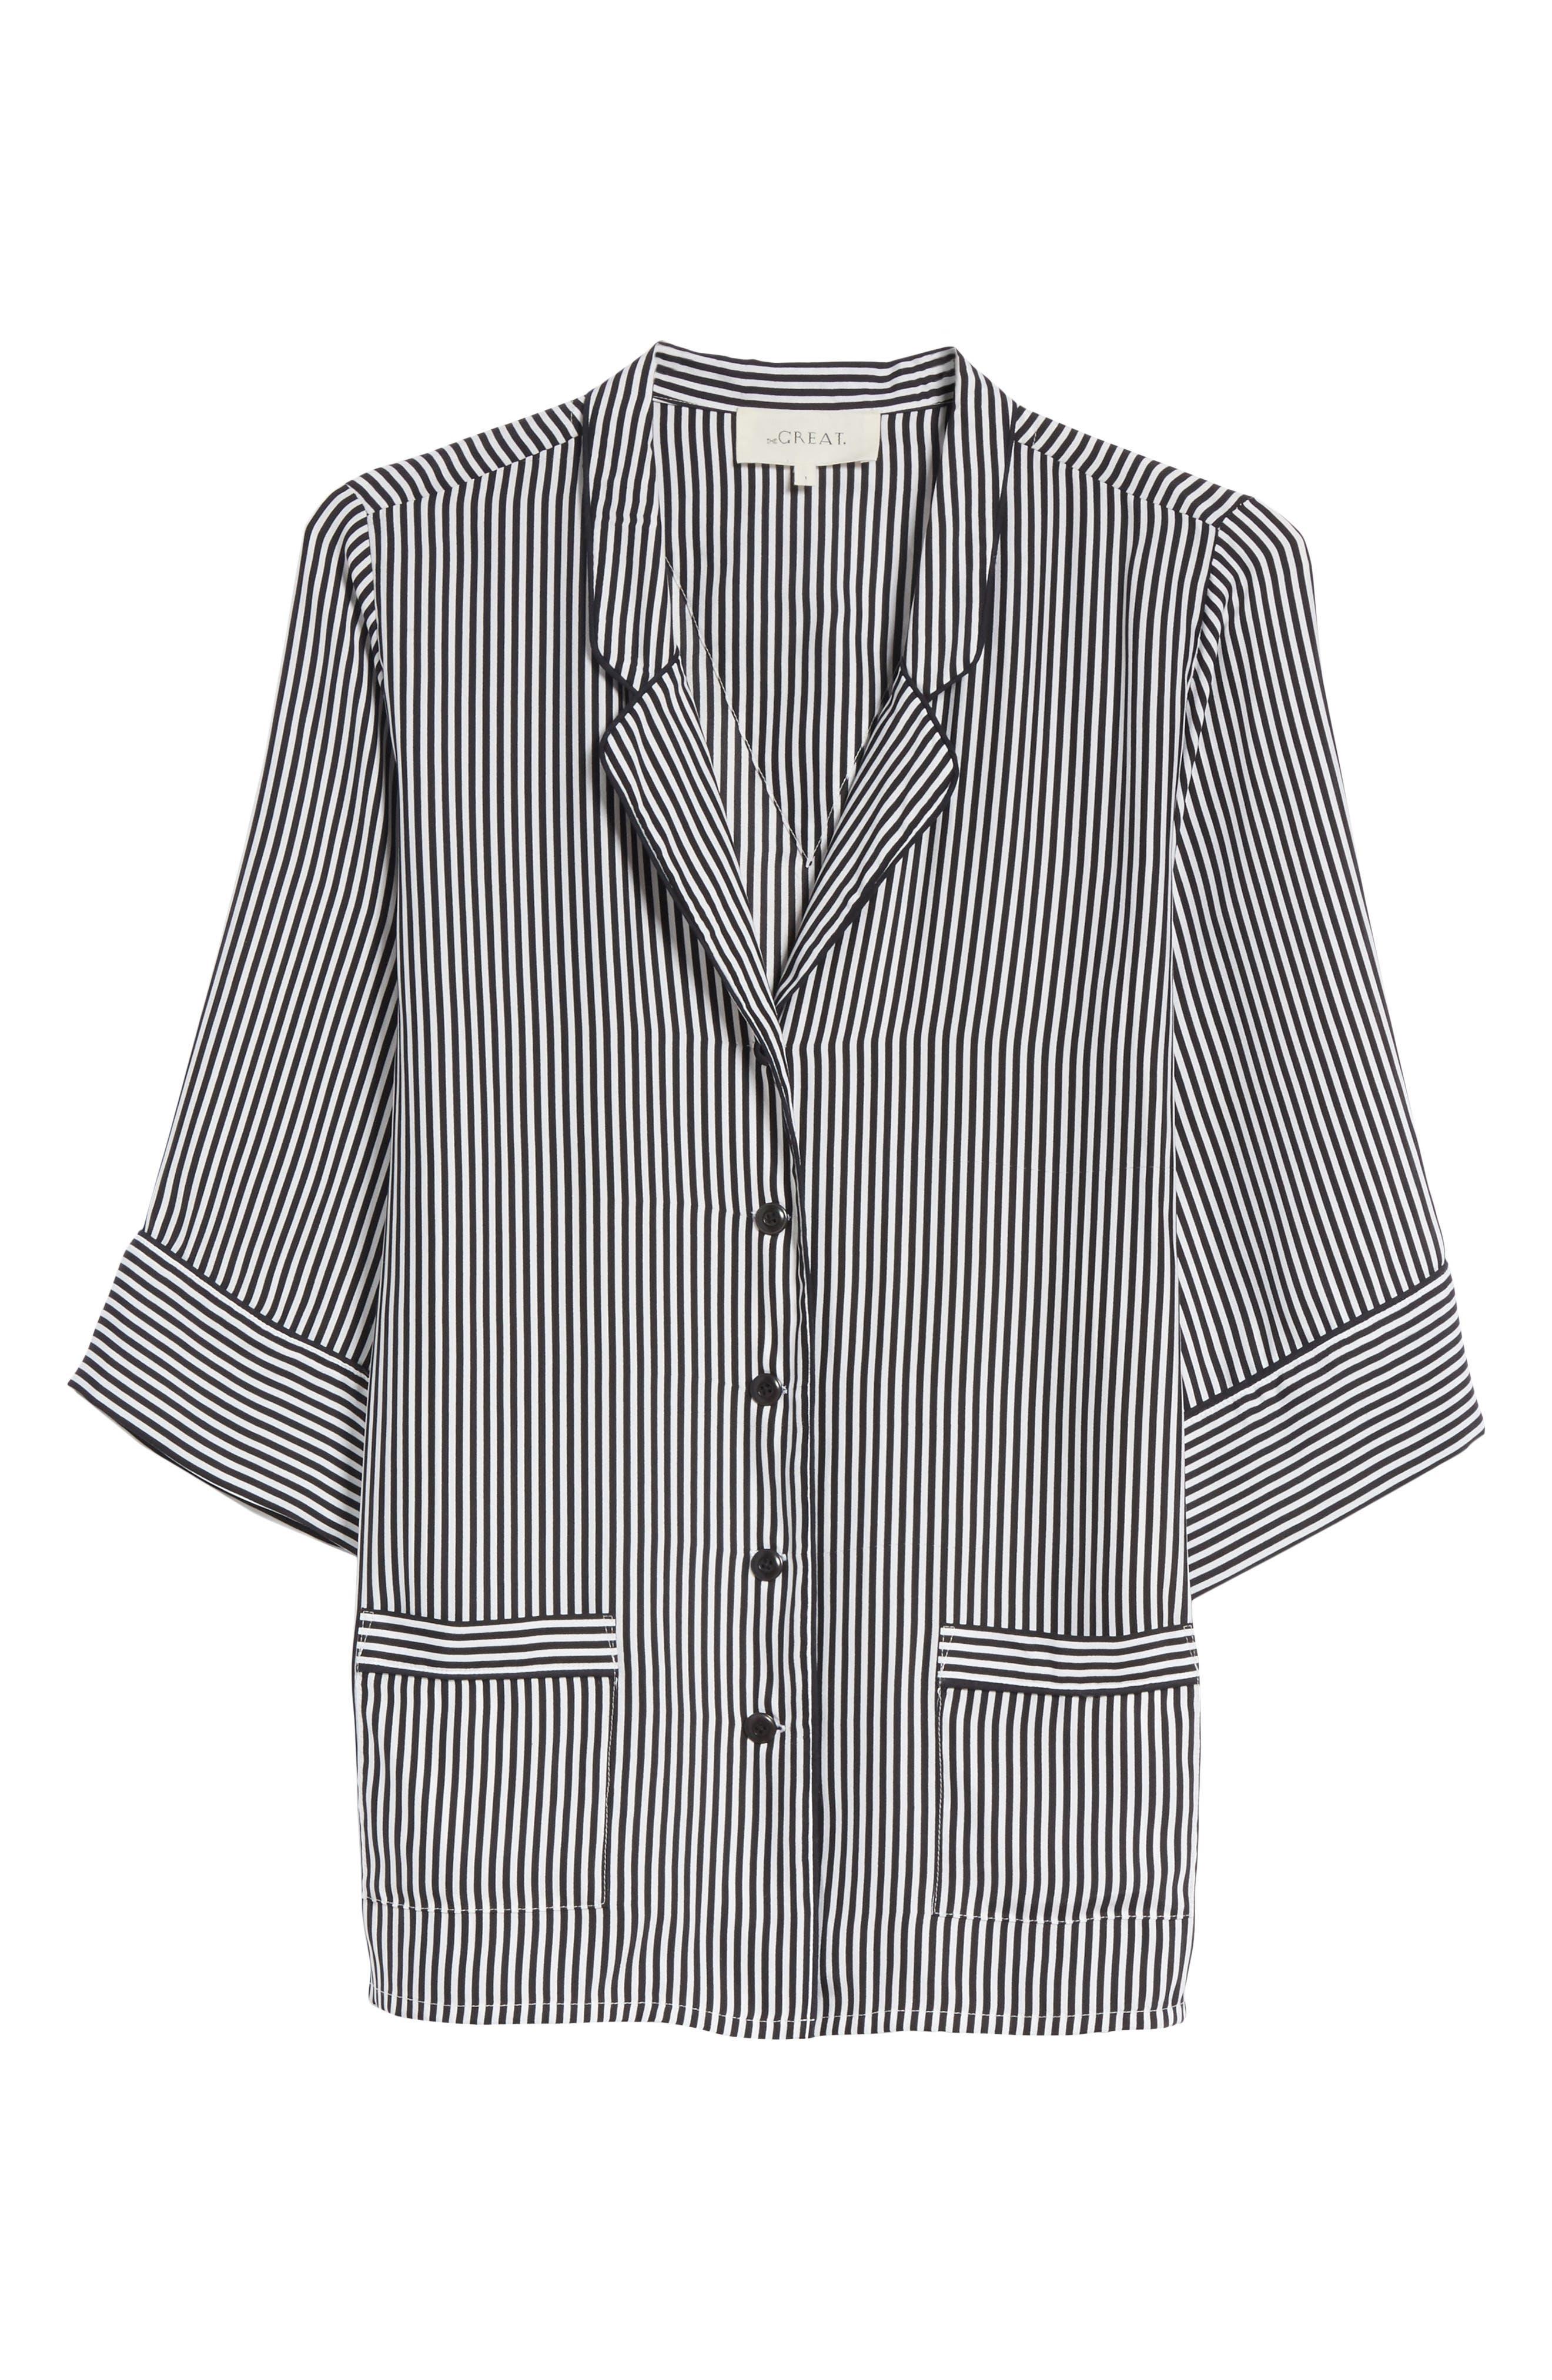 Pencil Stripe Silk Sleeper Shirt,                             Alternate thumbnail 9, color,                             Pencil Stripe